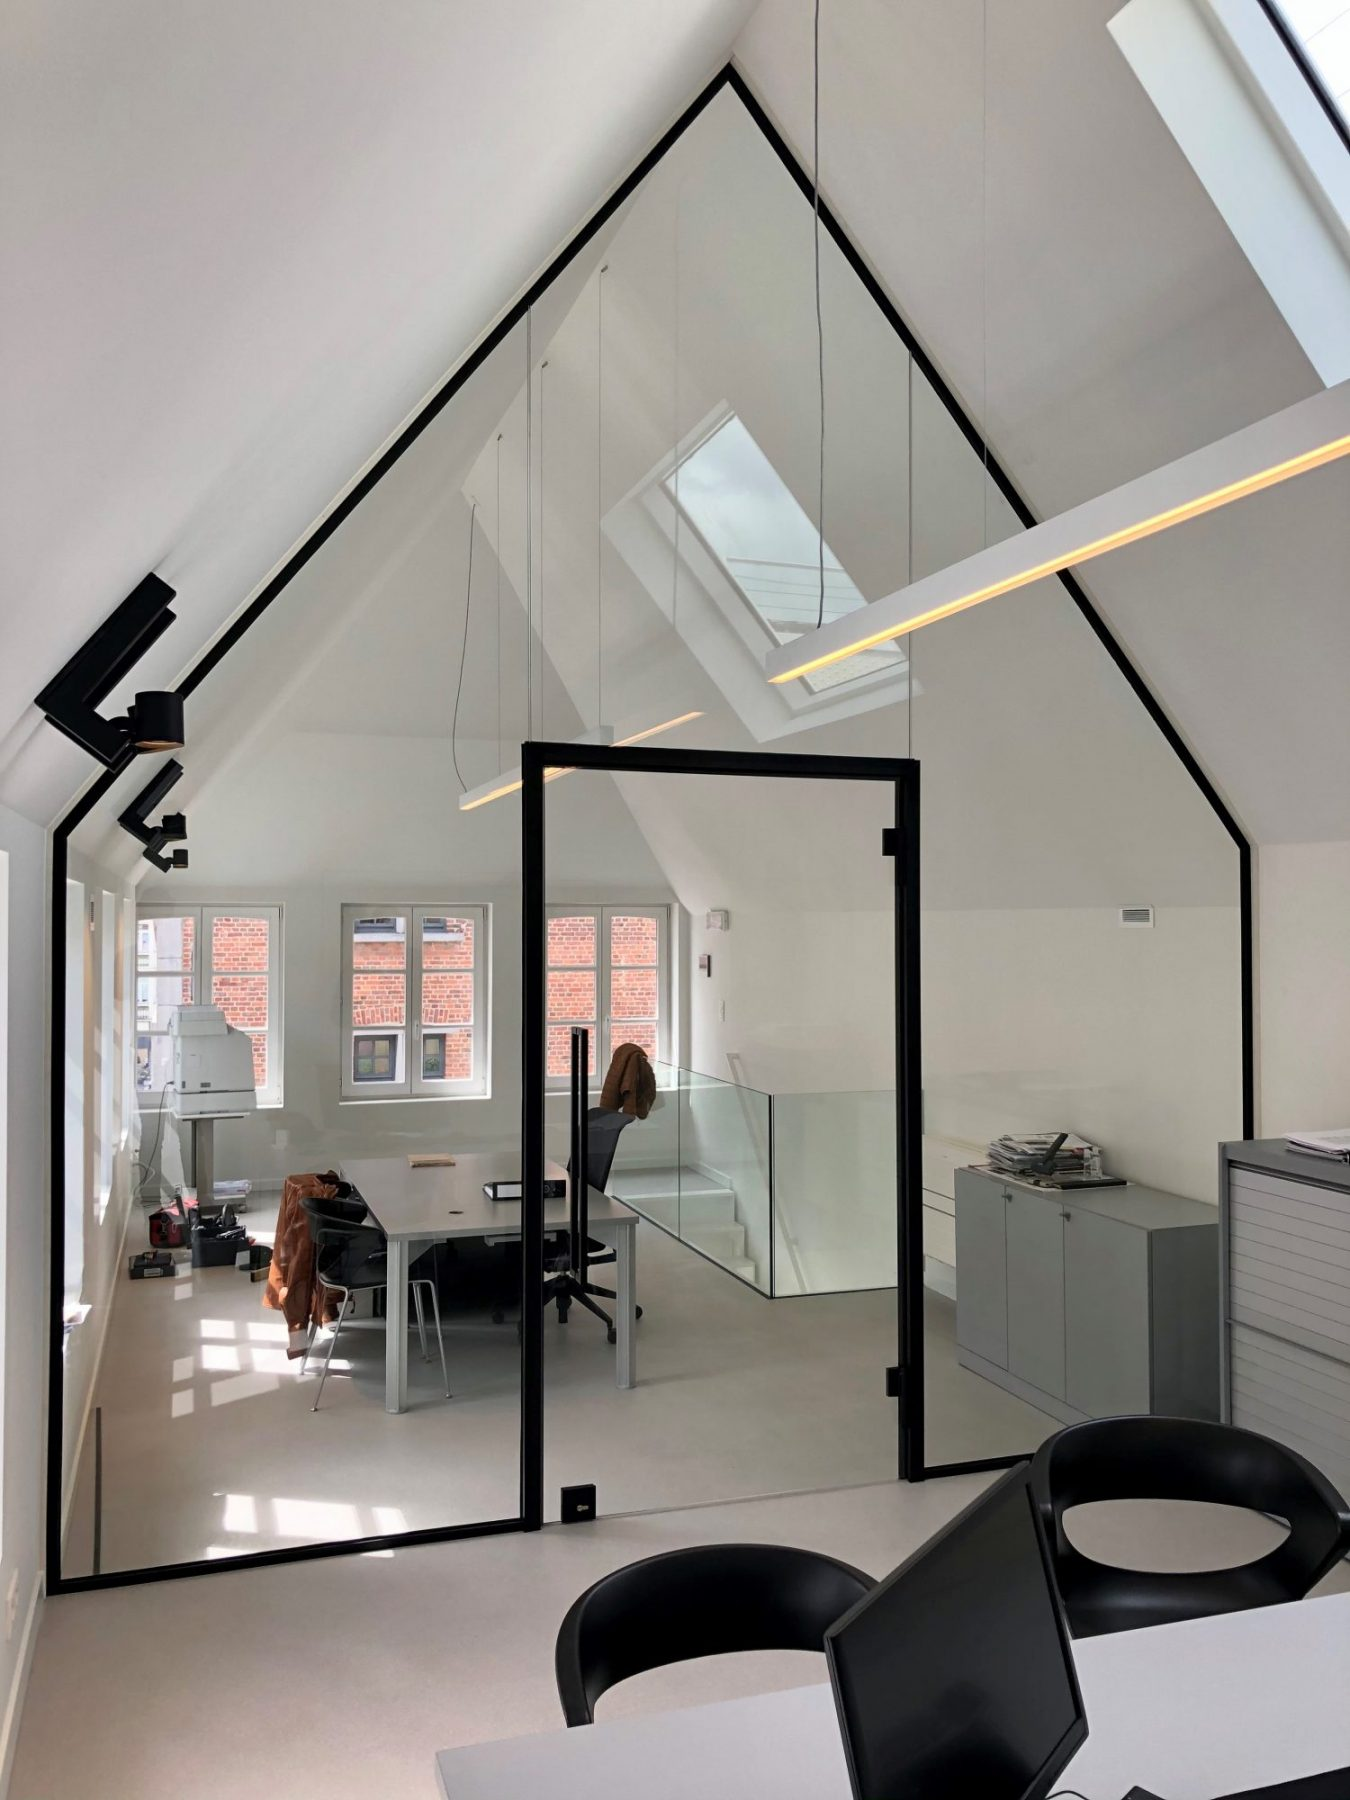 https://allglas.be/wp-content/uploads/2021/06/all-glas-walschaerts-bonheiden-interieurglas-steellook-glaswand-immovos-05-scaled.jpg